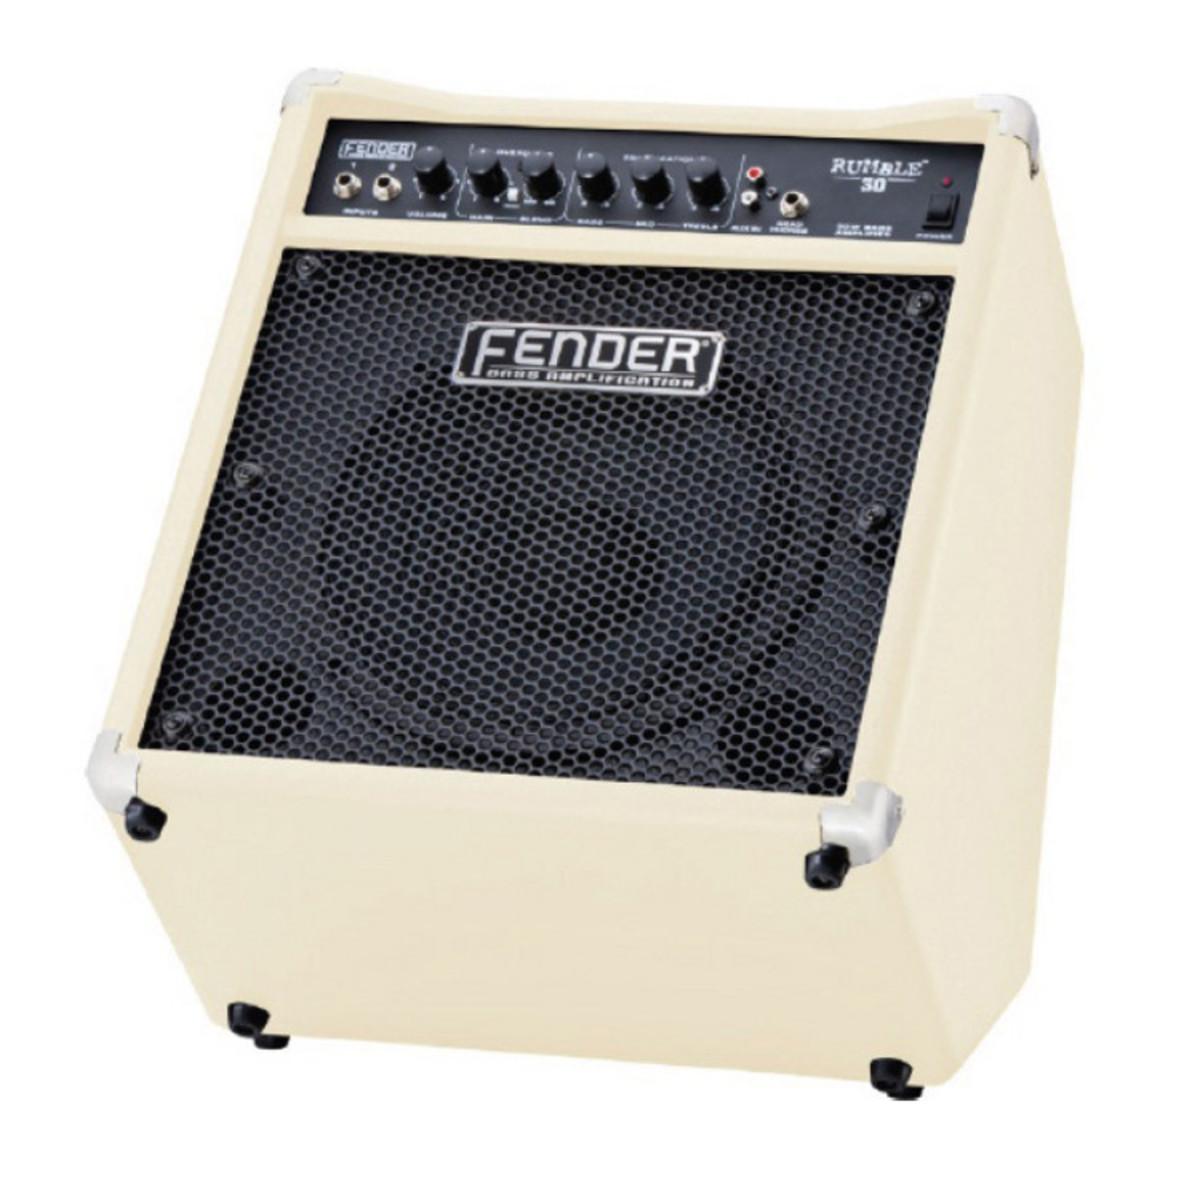 fender rumble 30 combo bass amp limited edition fsr blonde at. Black Bedroom Furniture Sets. Home Design Ideas